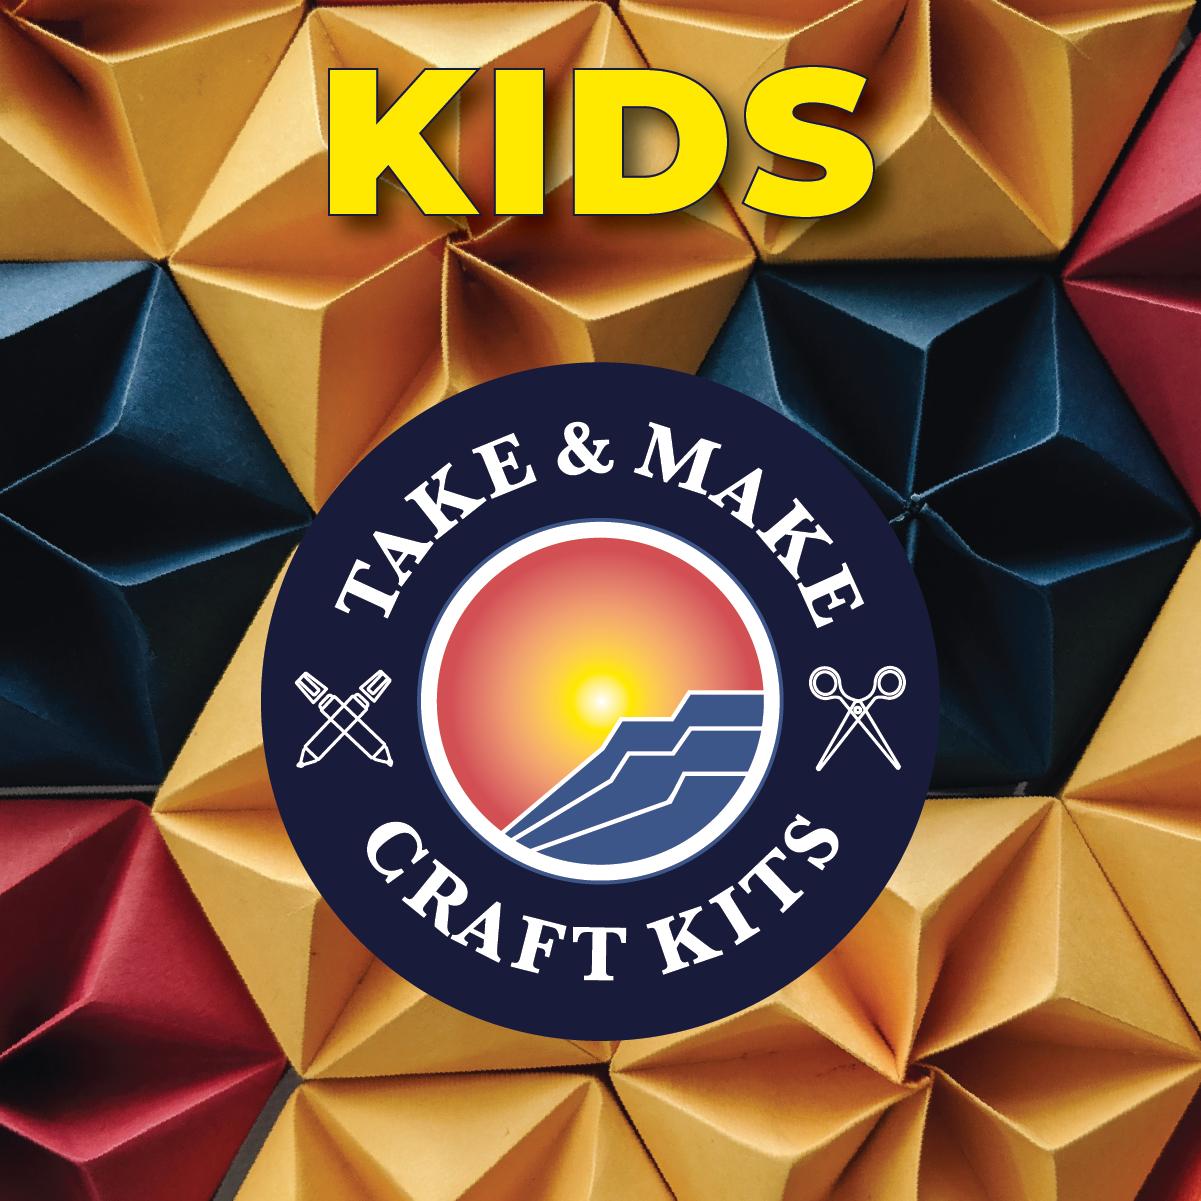 Kids Take and Make: Origami Swan